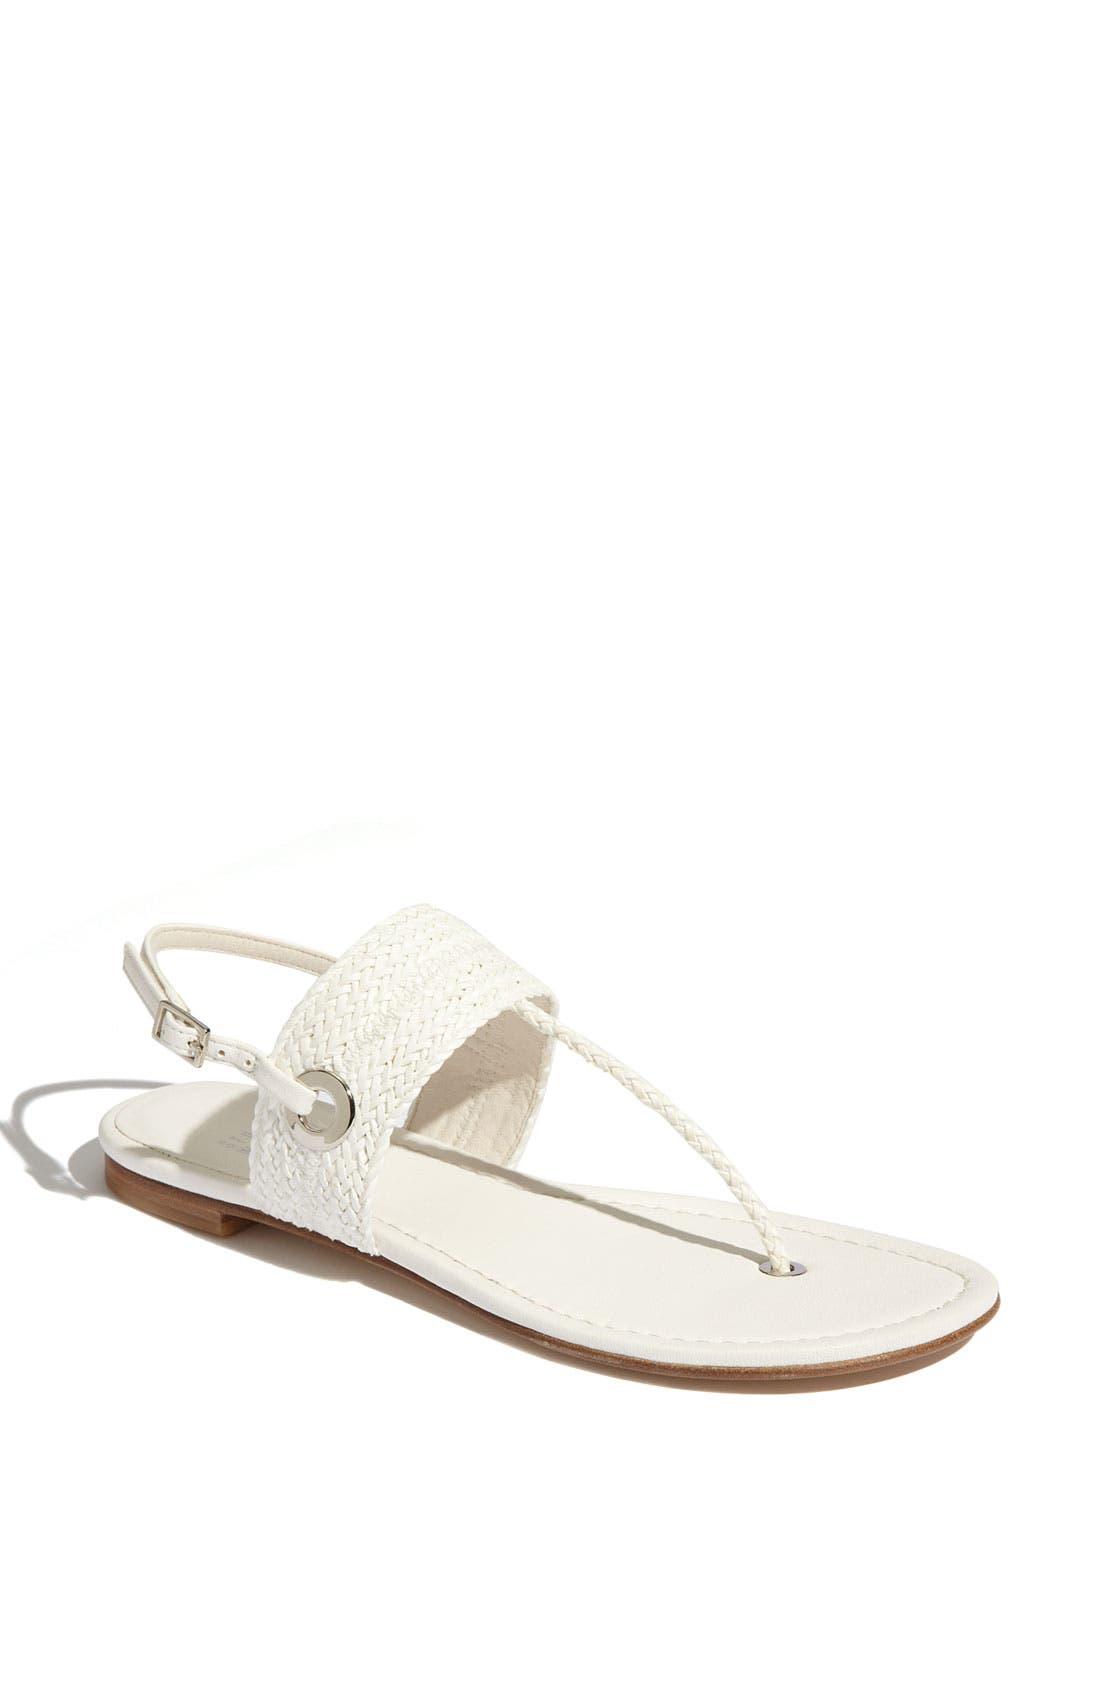 Alternate Image 1 Selected - Stuart Weitzman 'Bimini' Sandal